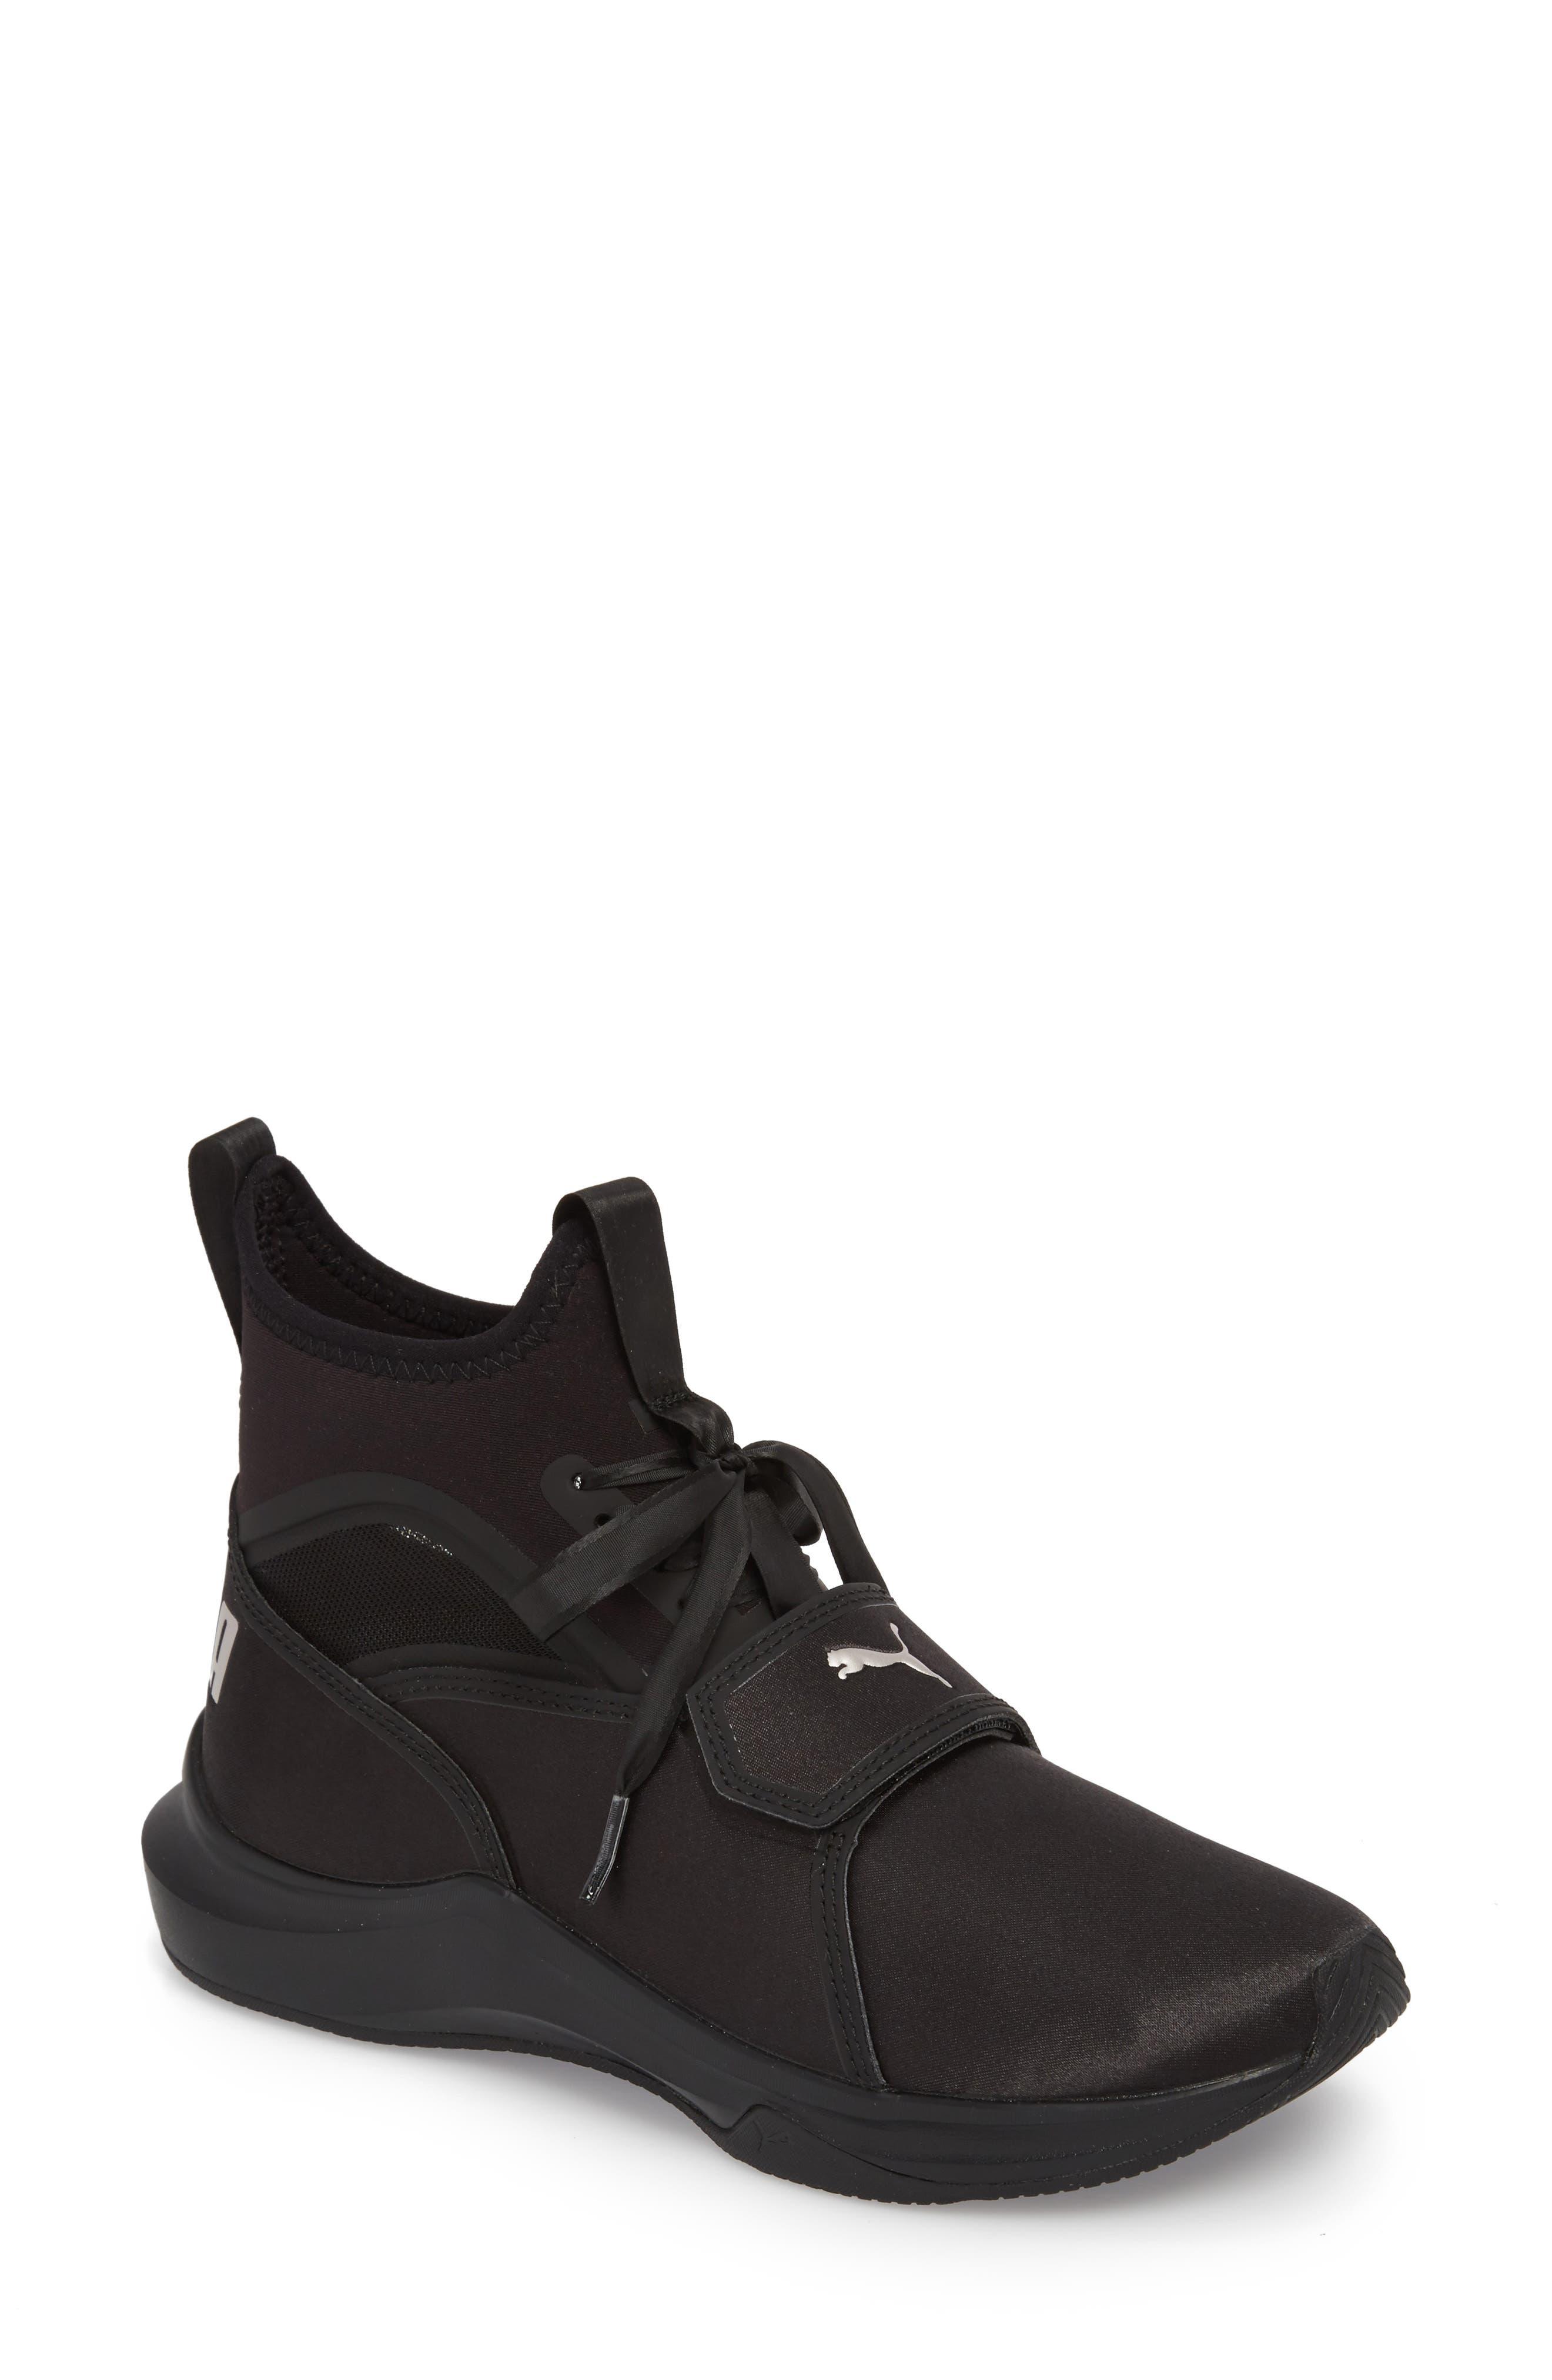 Phenom Satin EP High Top Training Shoe,                         Main,                         color, Puma Black/ Puma Black